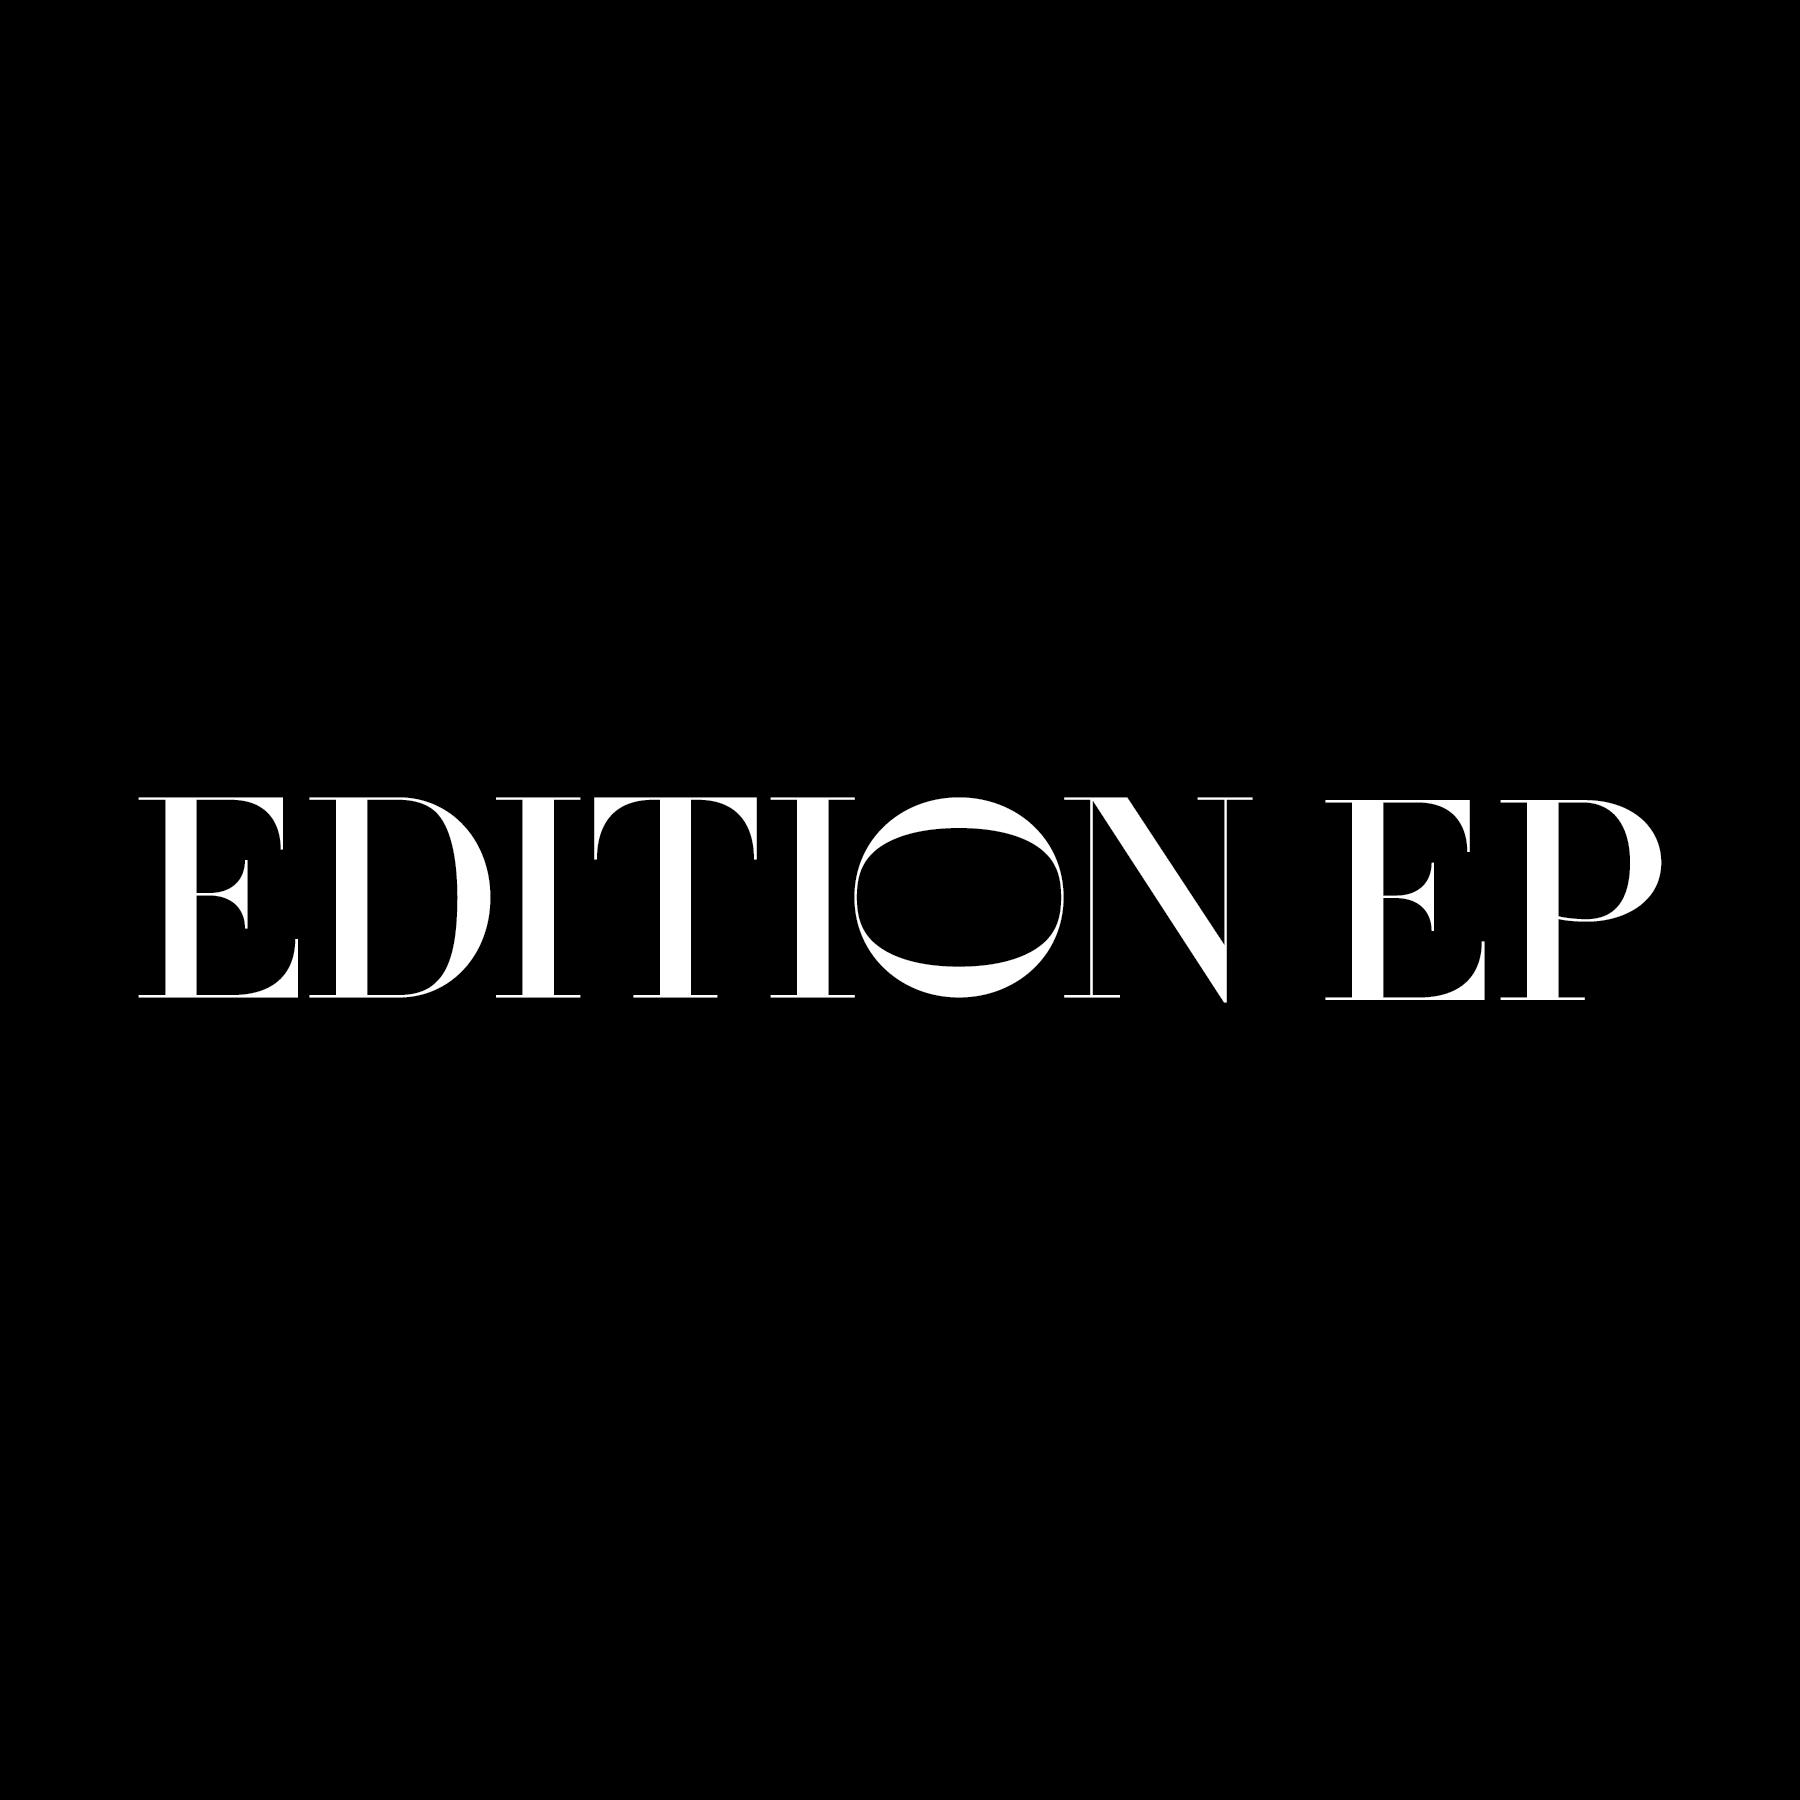 EDITION EP